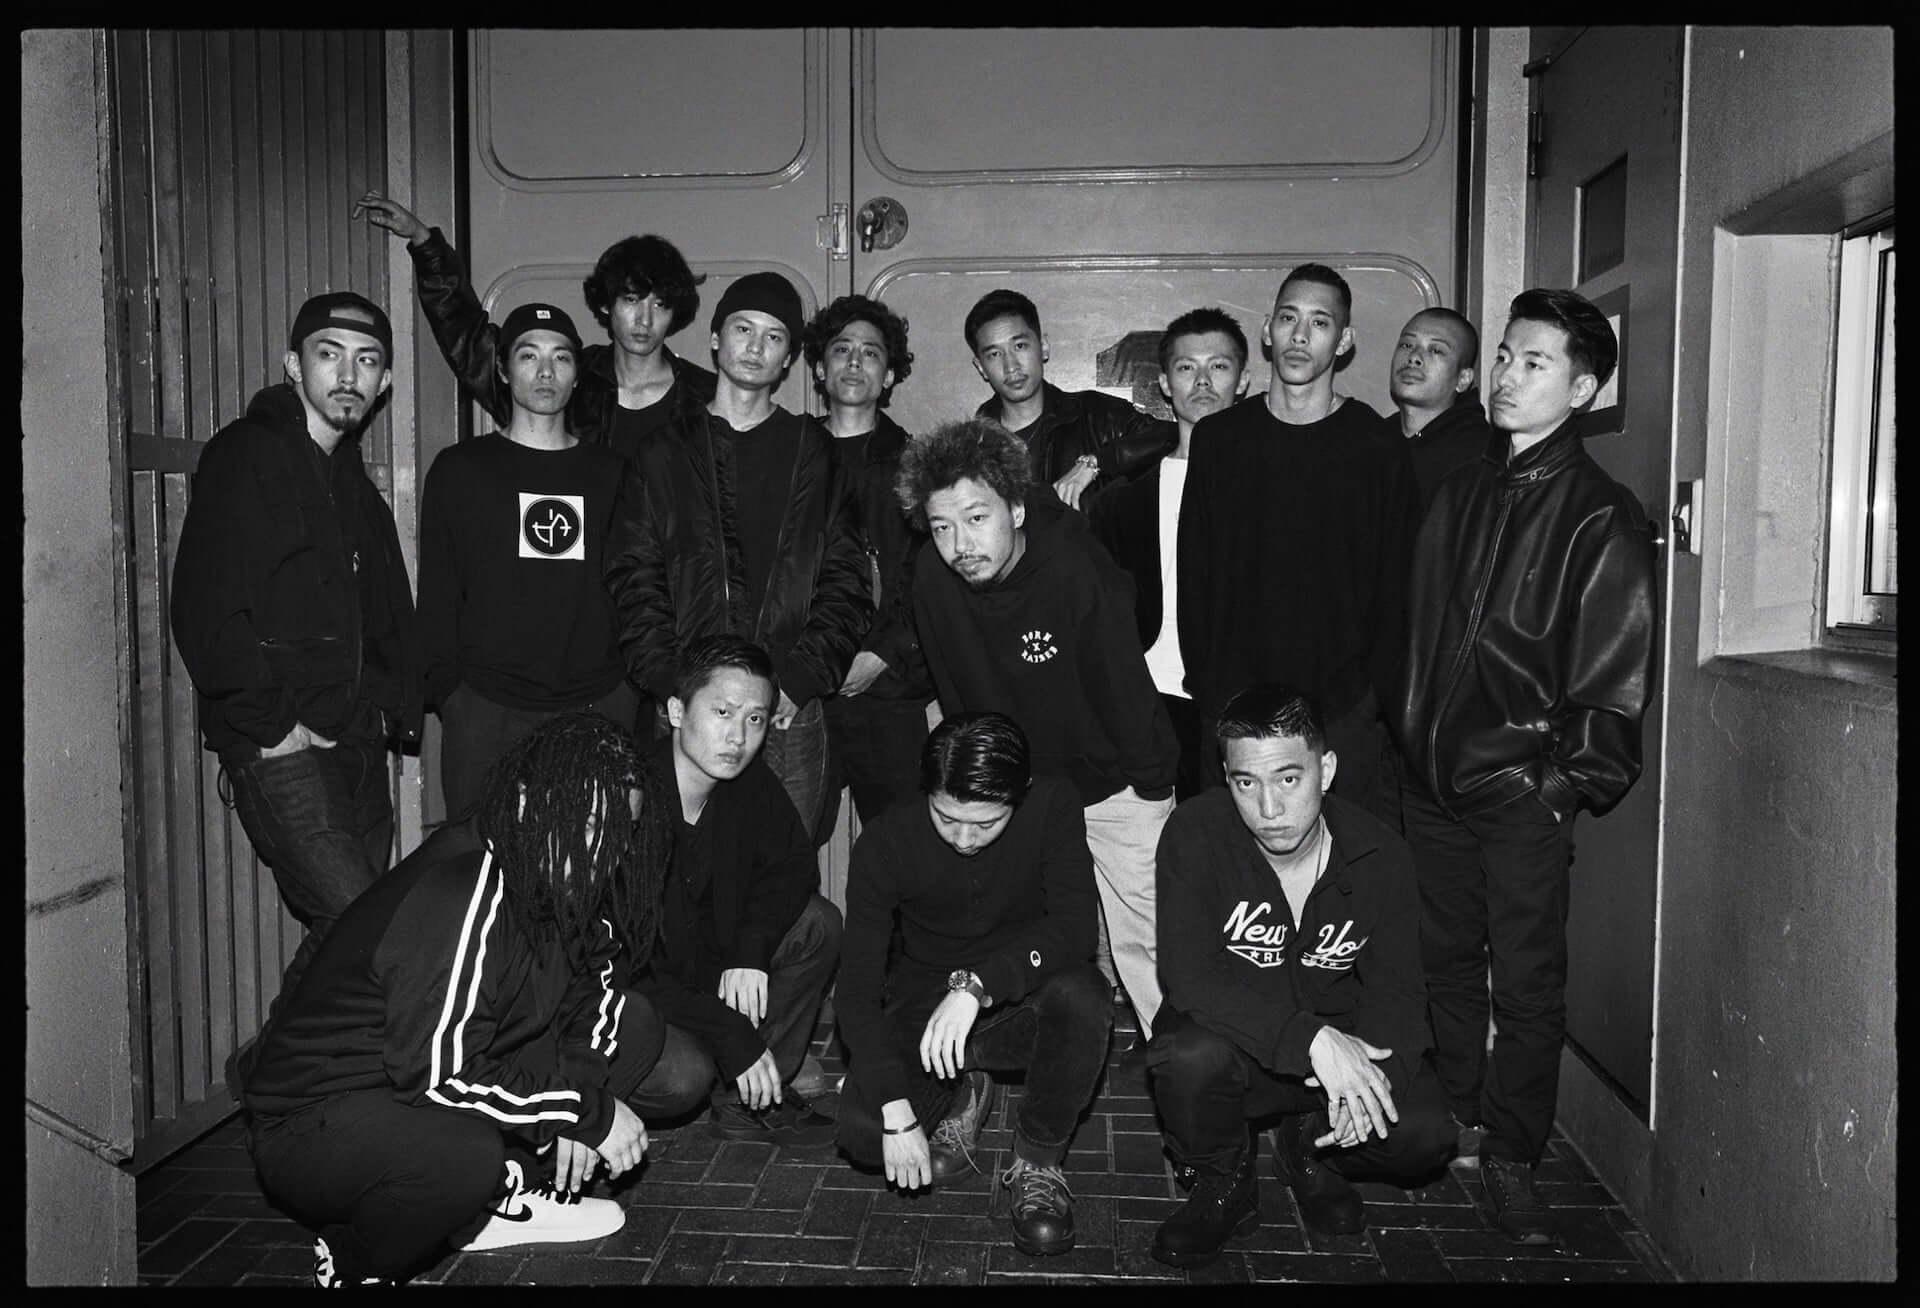 KANDYTOWNが<ADVISORY TOUR '19>のアフターパーティーを渋谷VISIONにて開催! music191030_kandytown_main-1920x1308